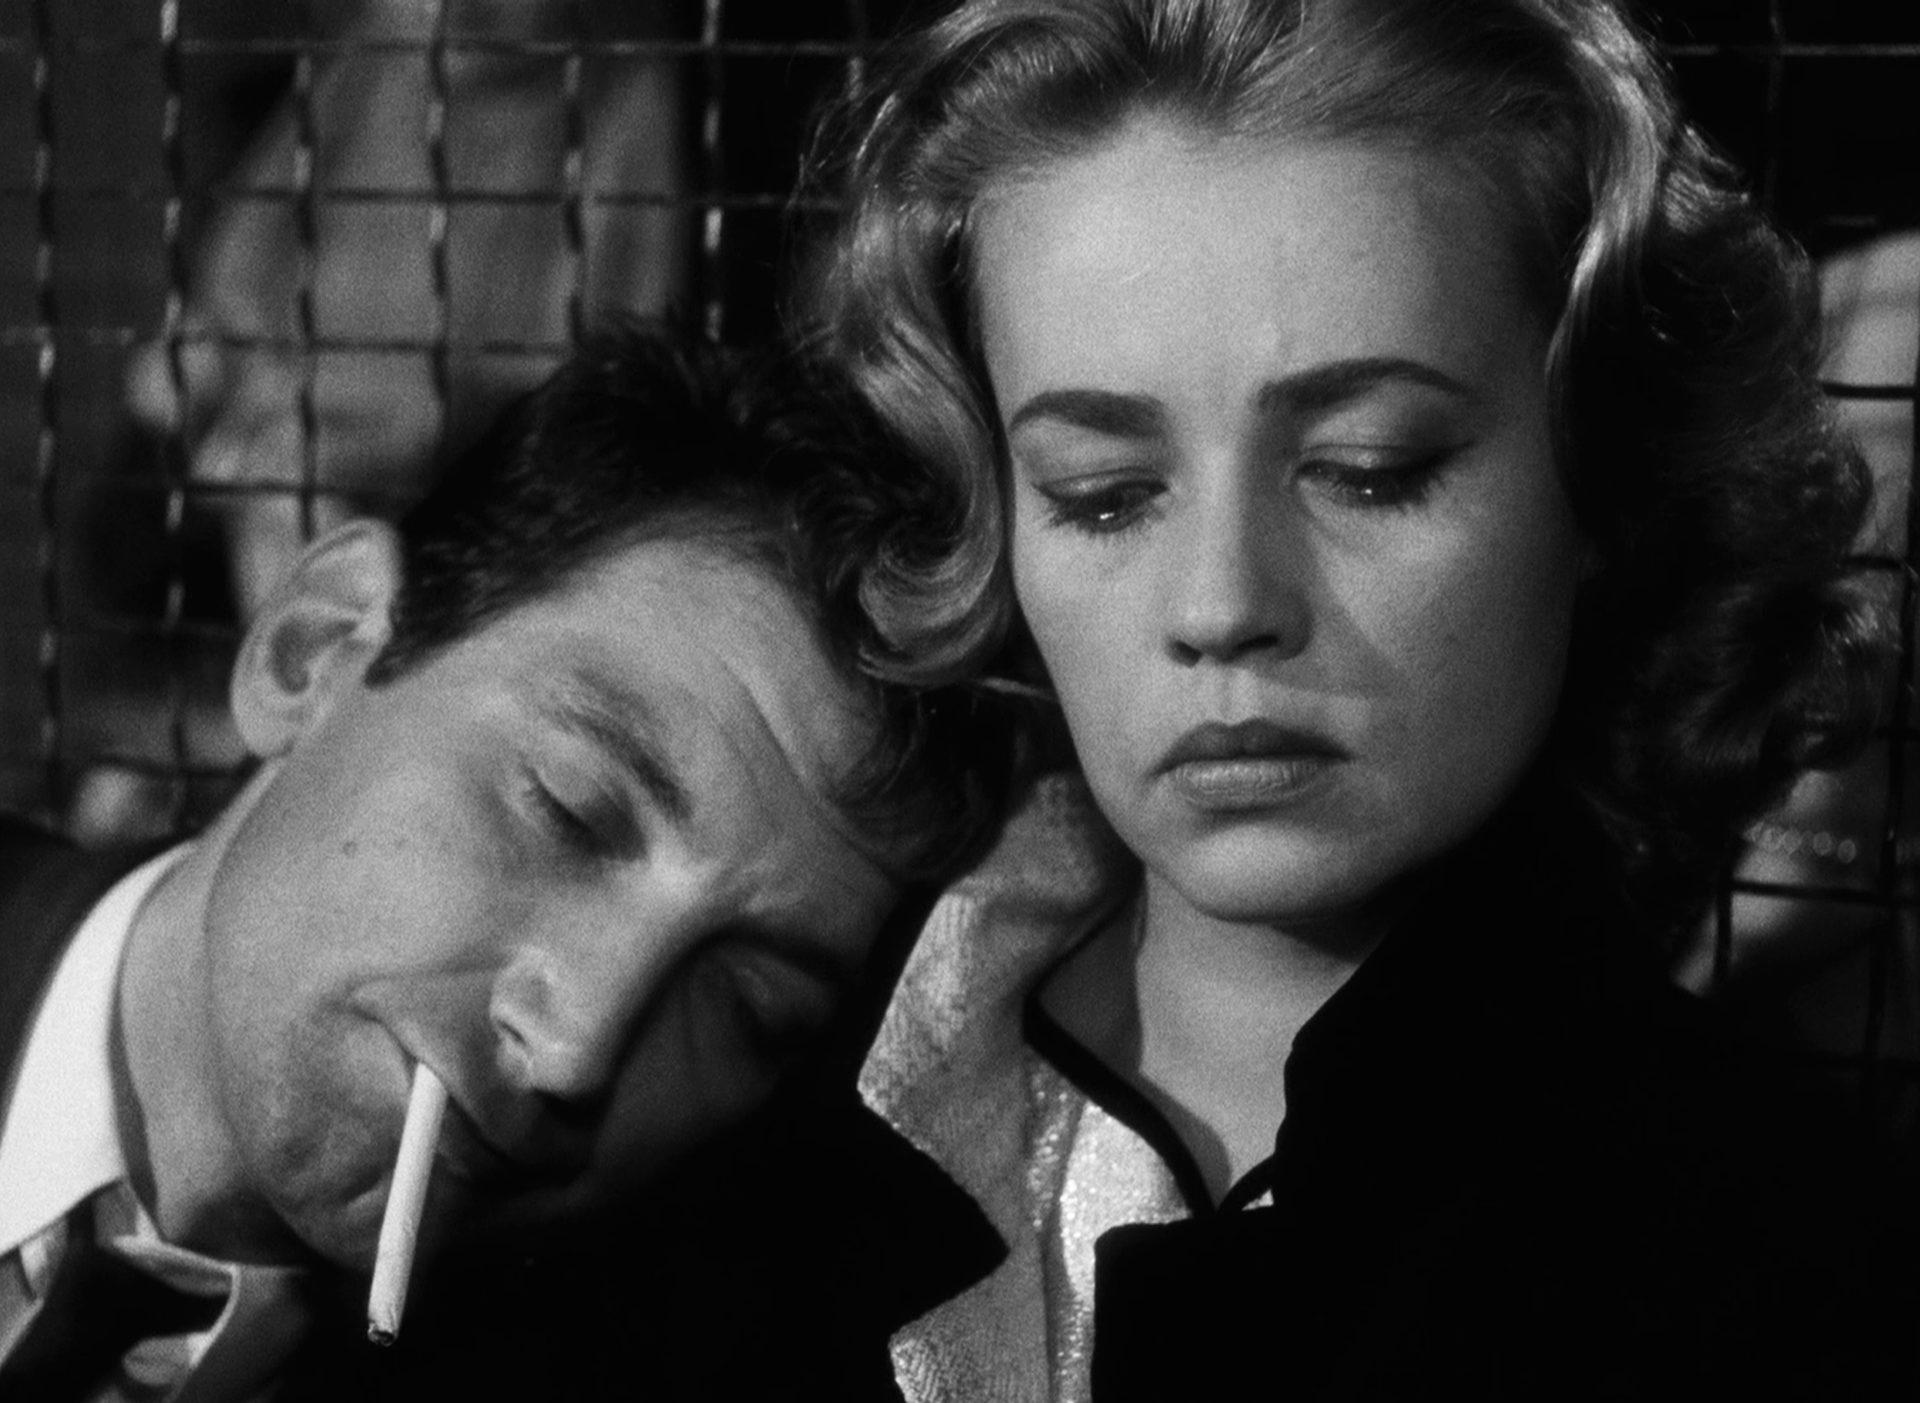 Szene aus 'Fahrstuhl zum Schafott(1958)', Copyright: Nouvelles Éditions de Films NEF